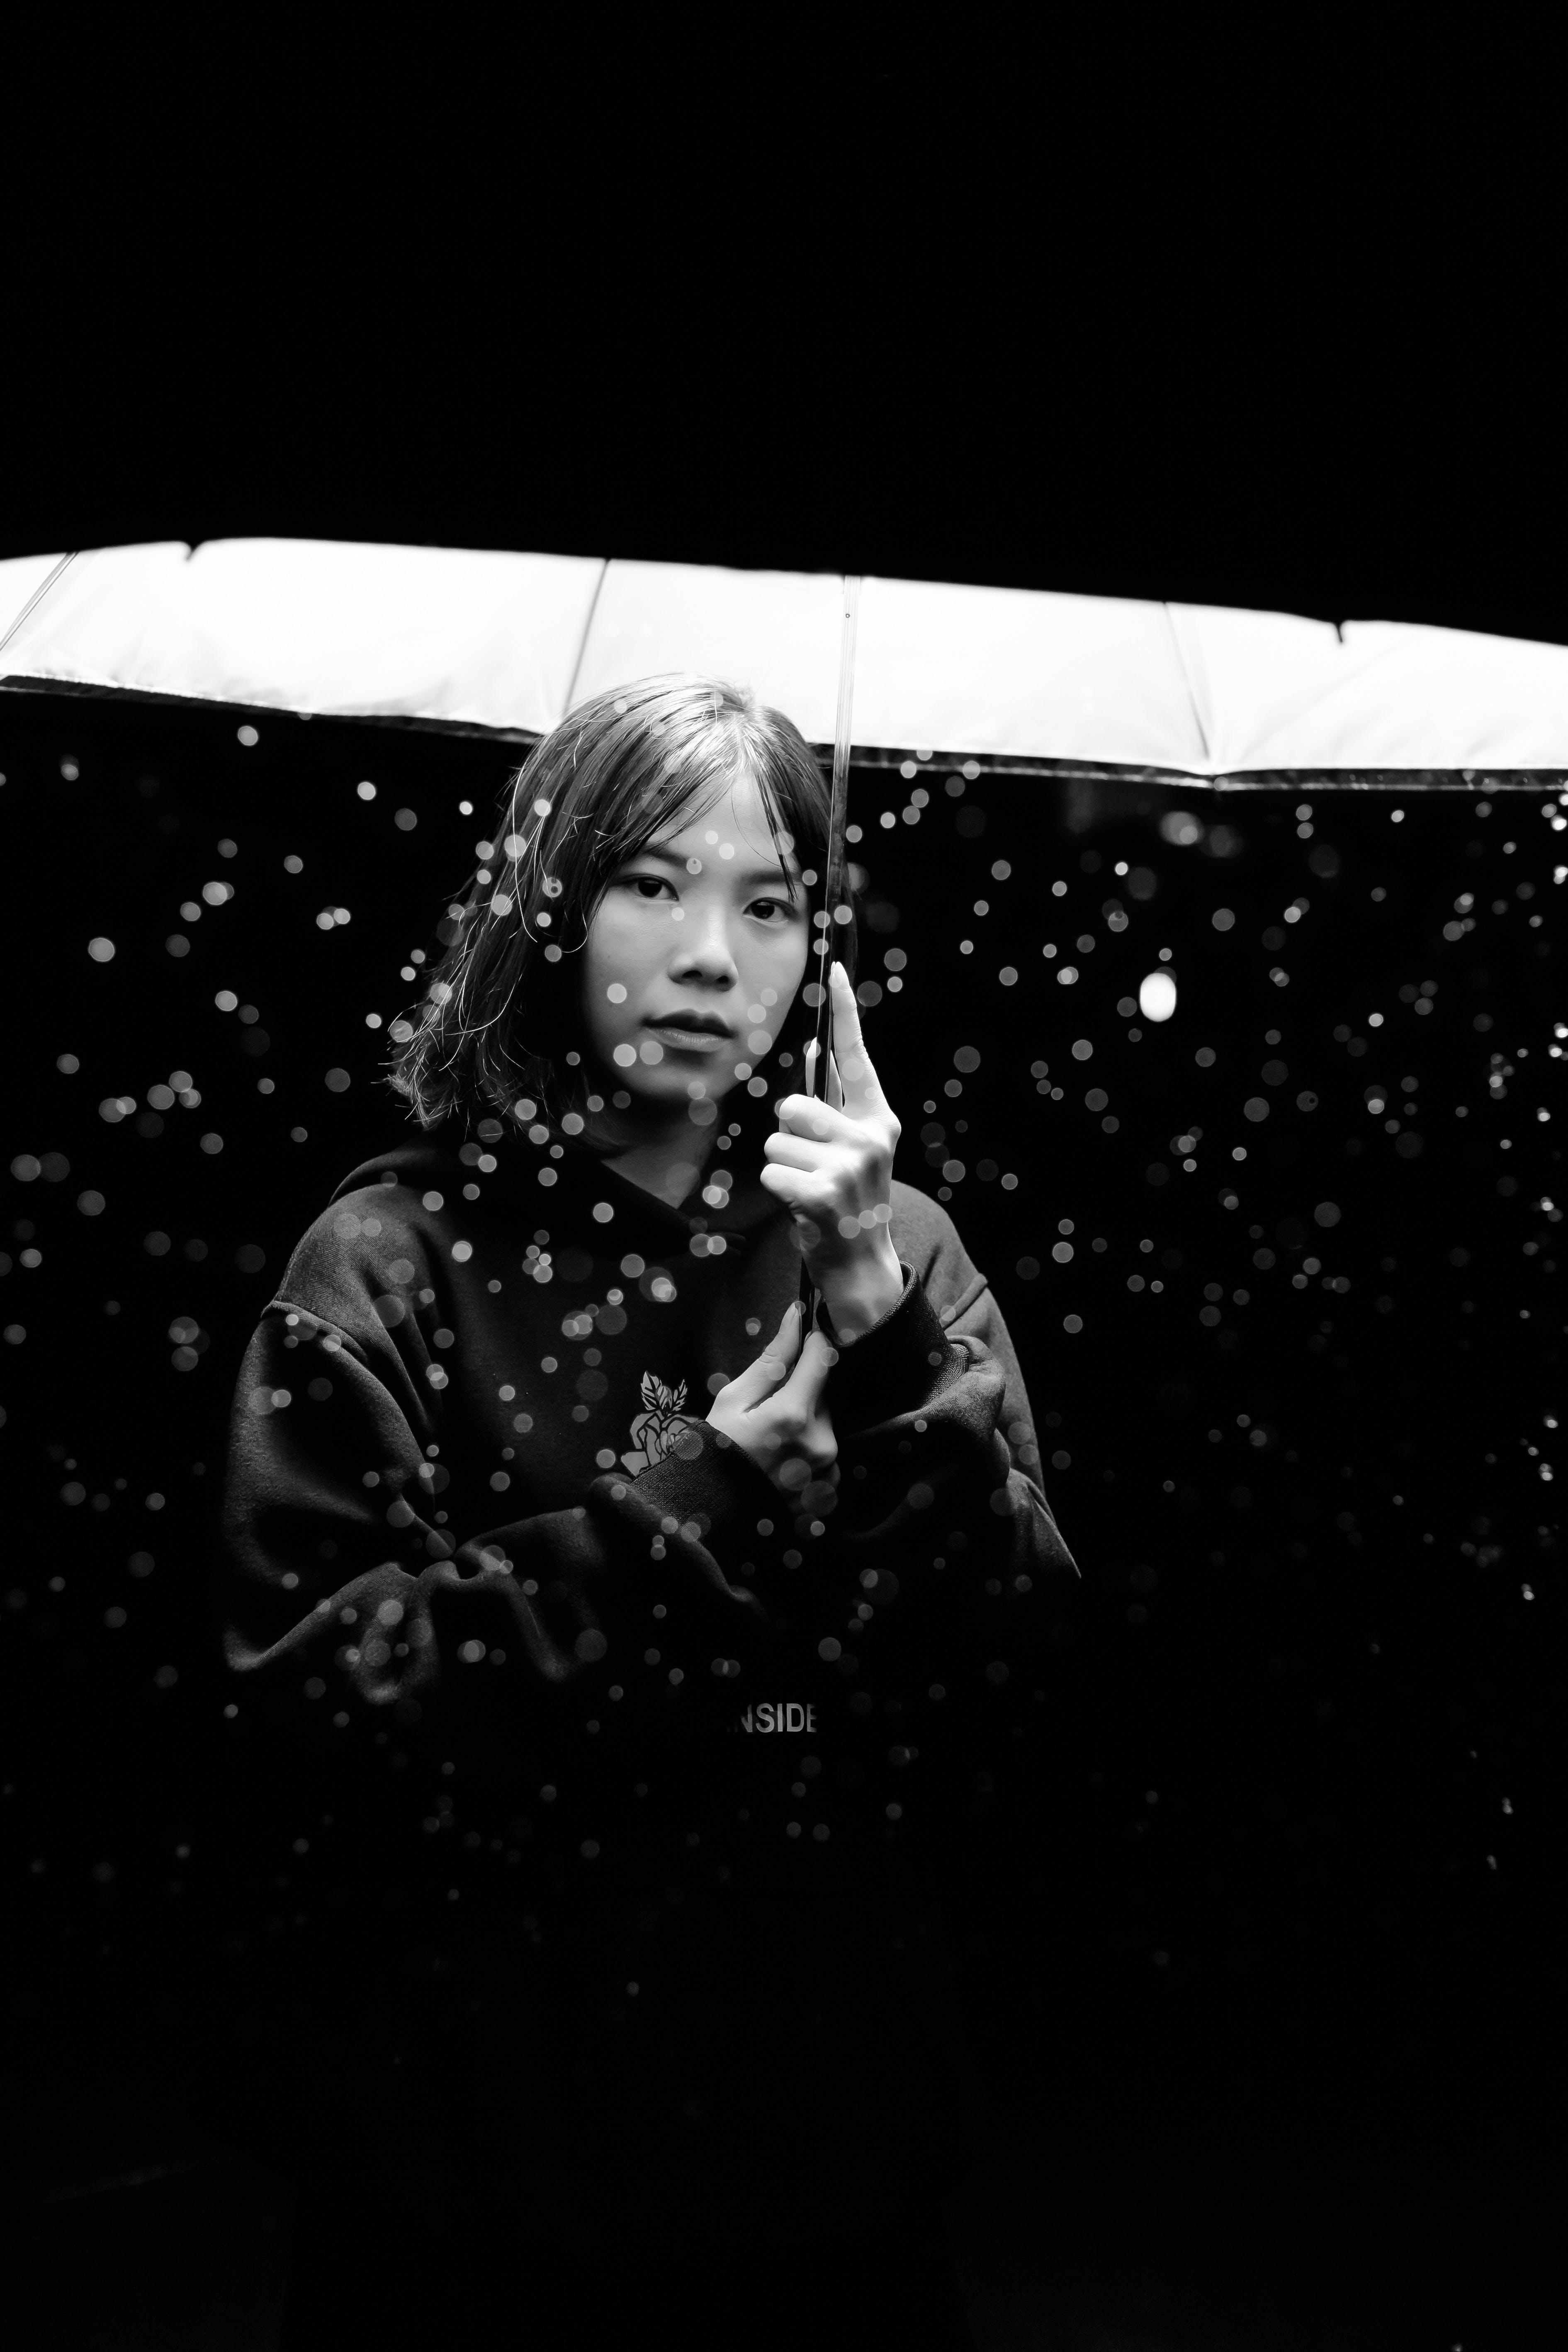 Greyscale Photography of Woman Holding Umbrella